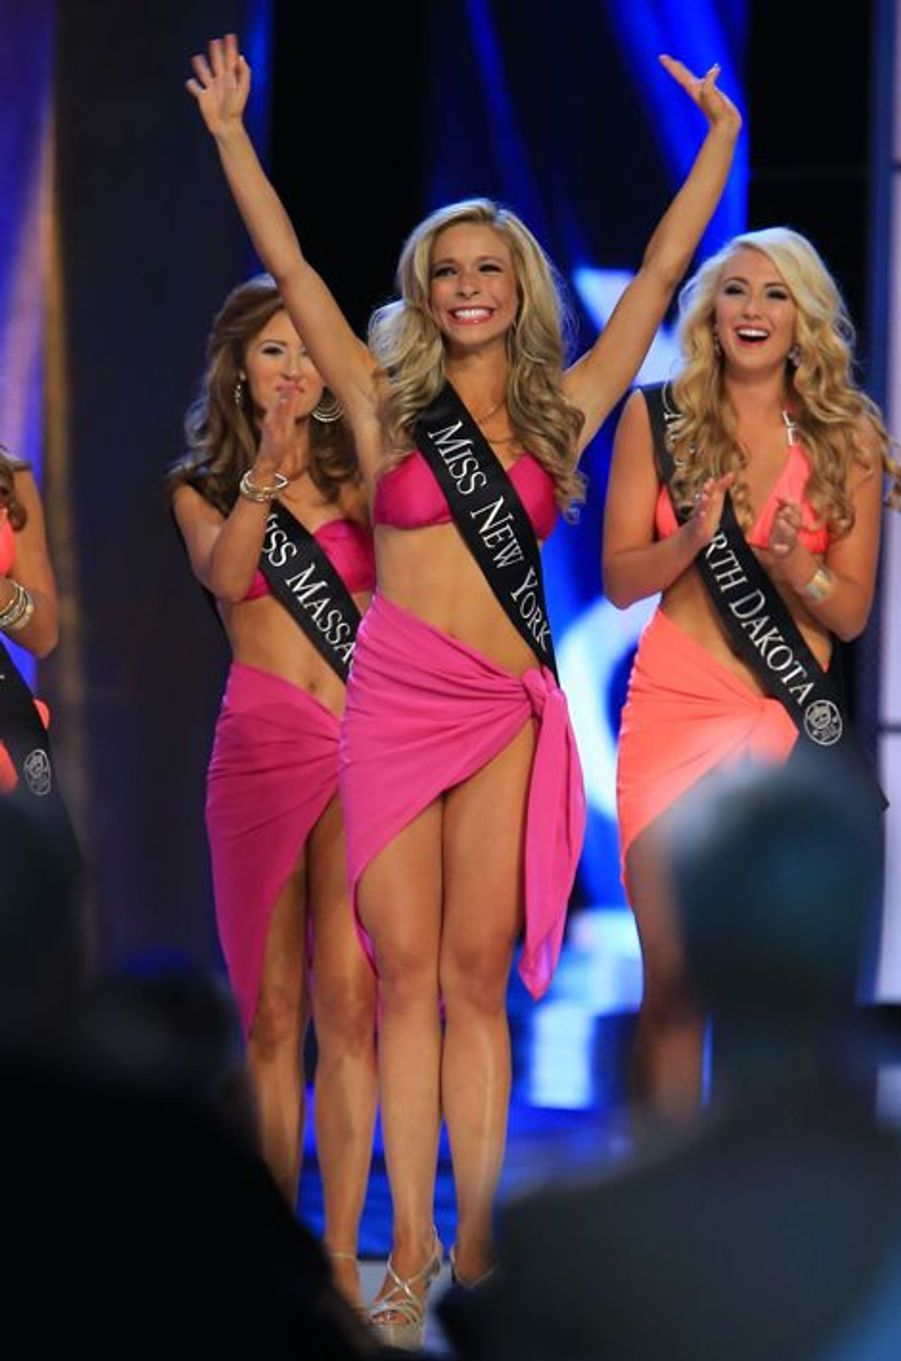 Kira Kazantsev, Miss New York, a été élue Miss America 2015 le 14 septembre 2014 à Atlantic City.